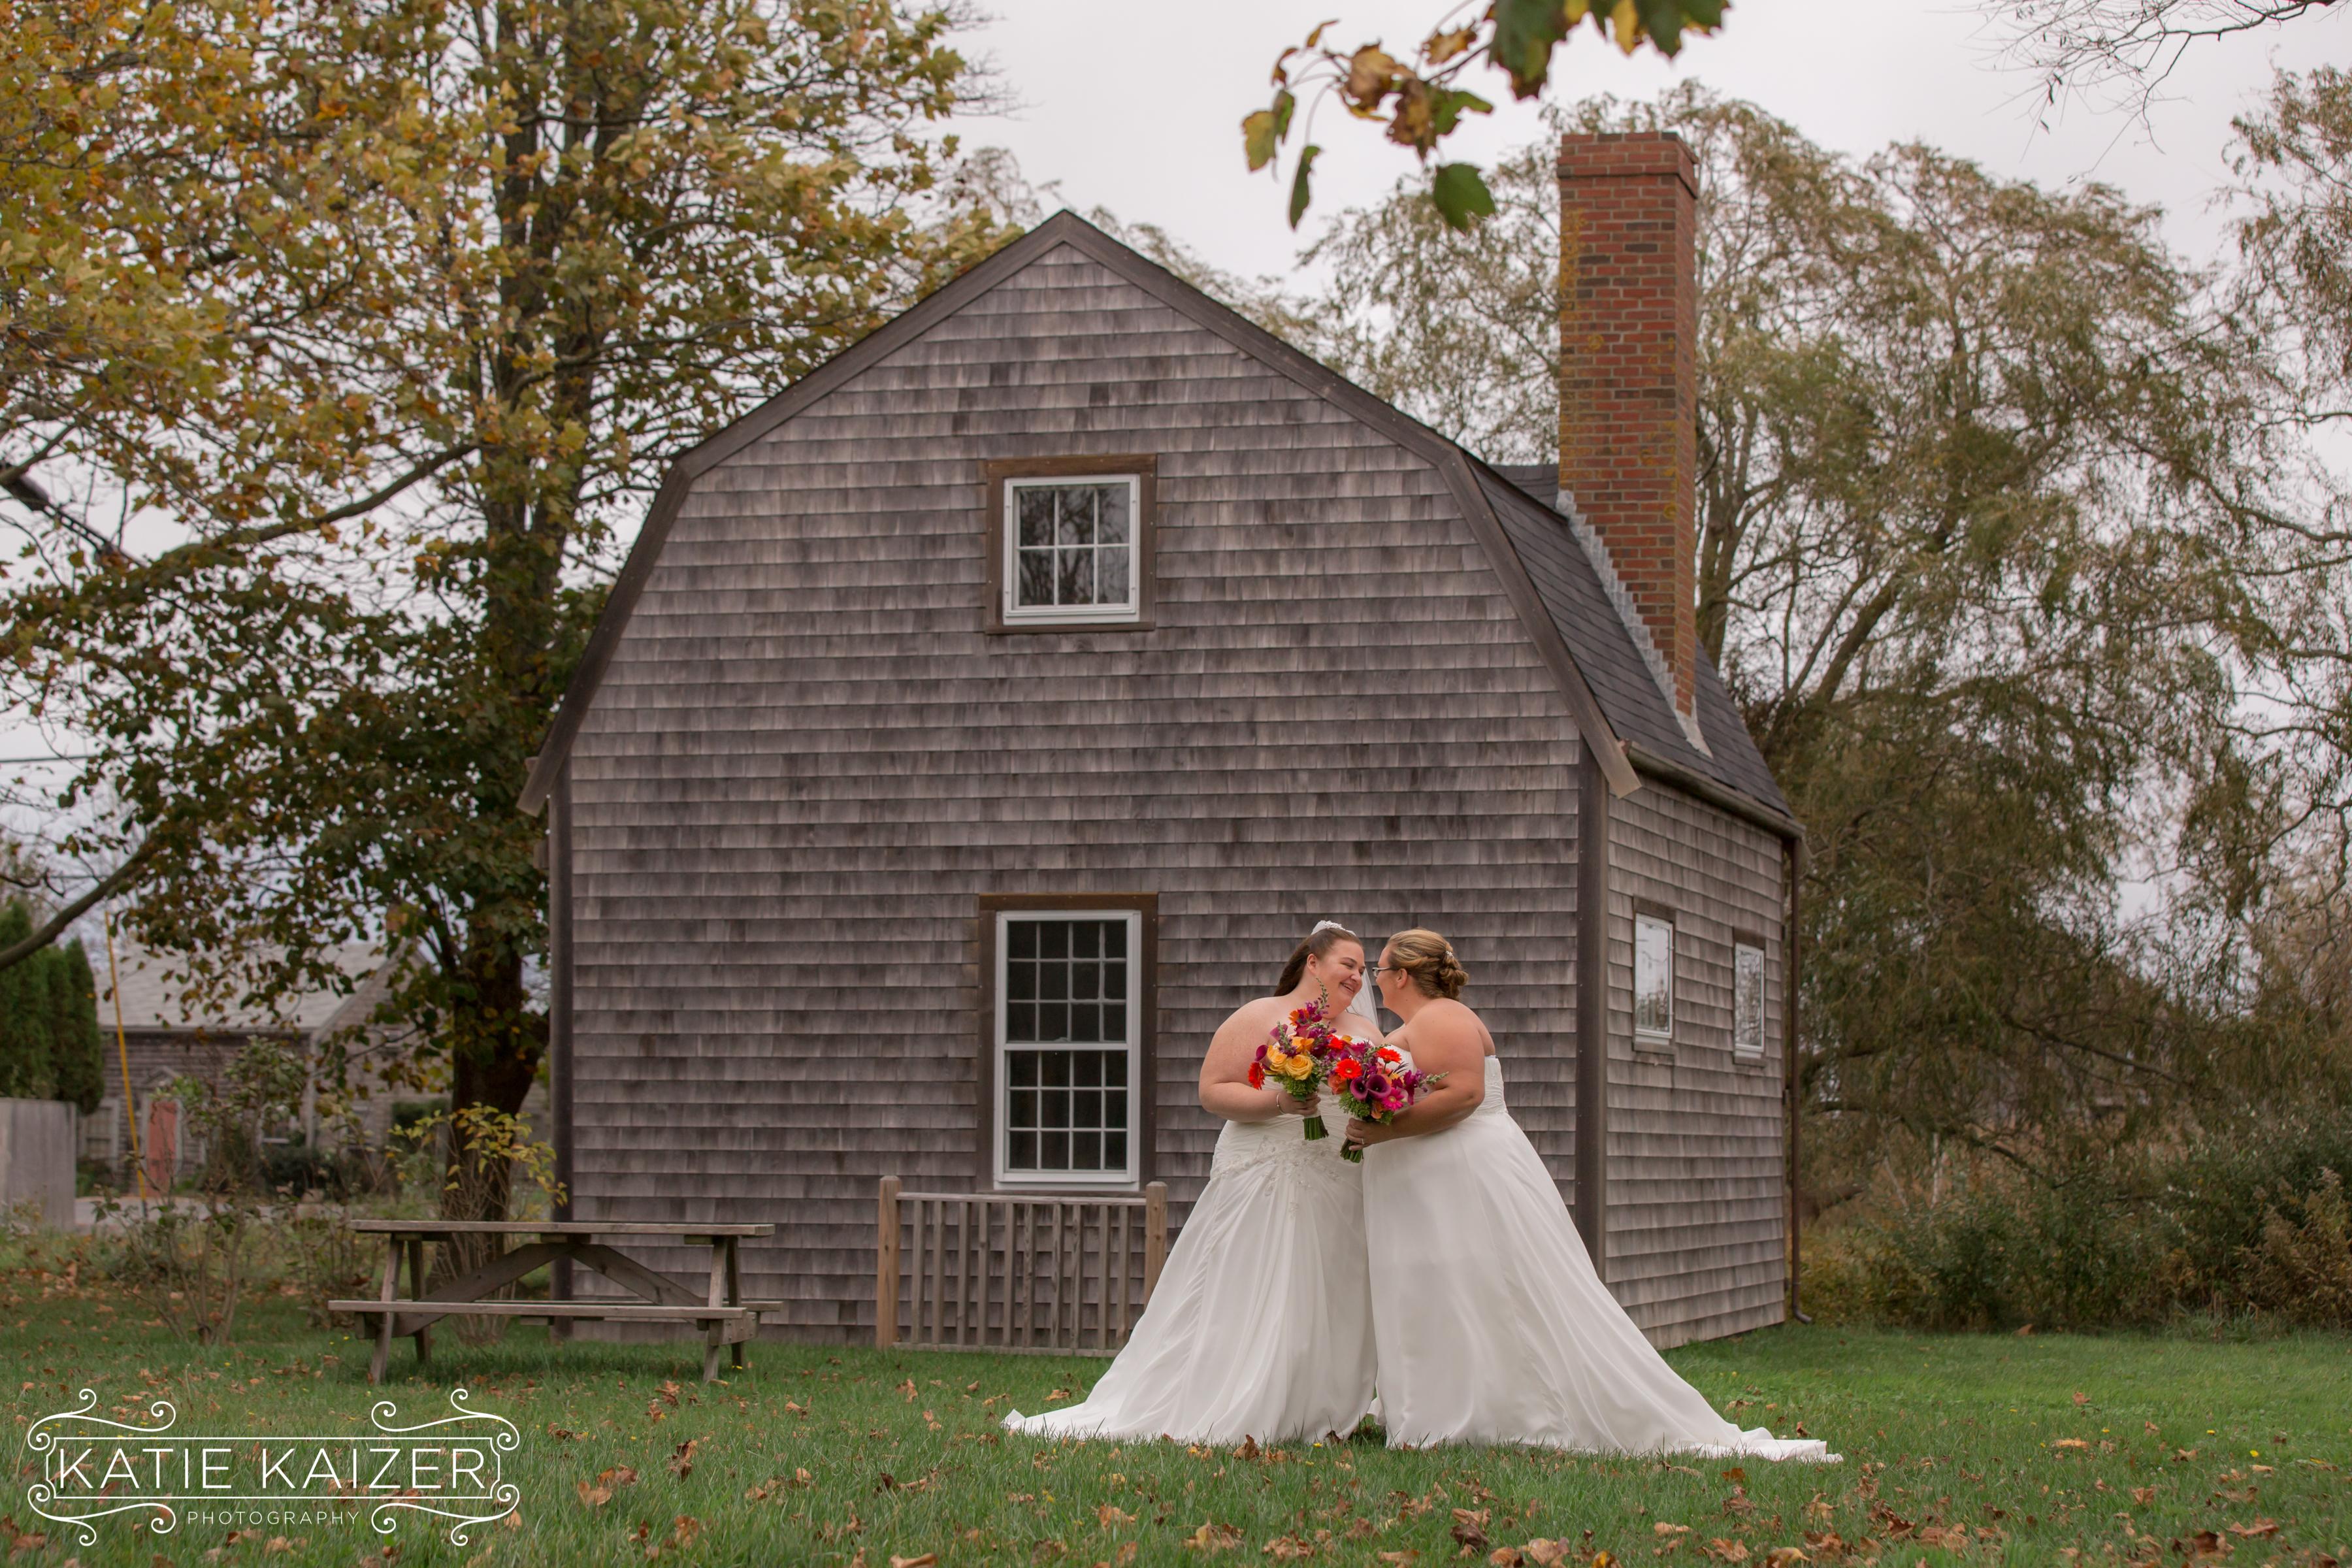 Kate splaine wedding